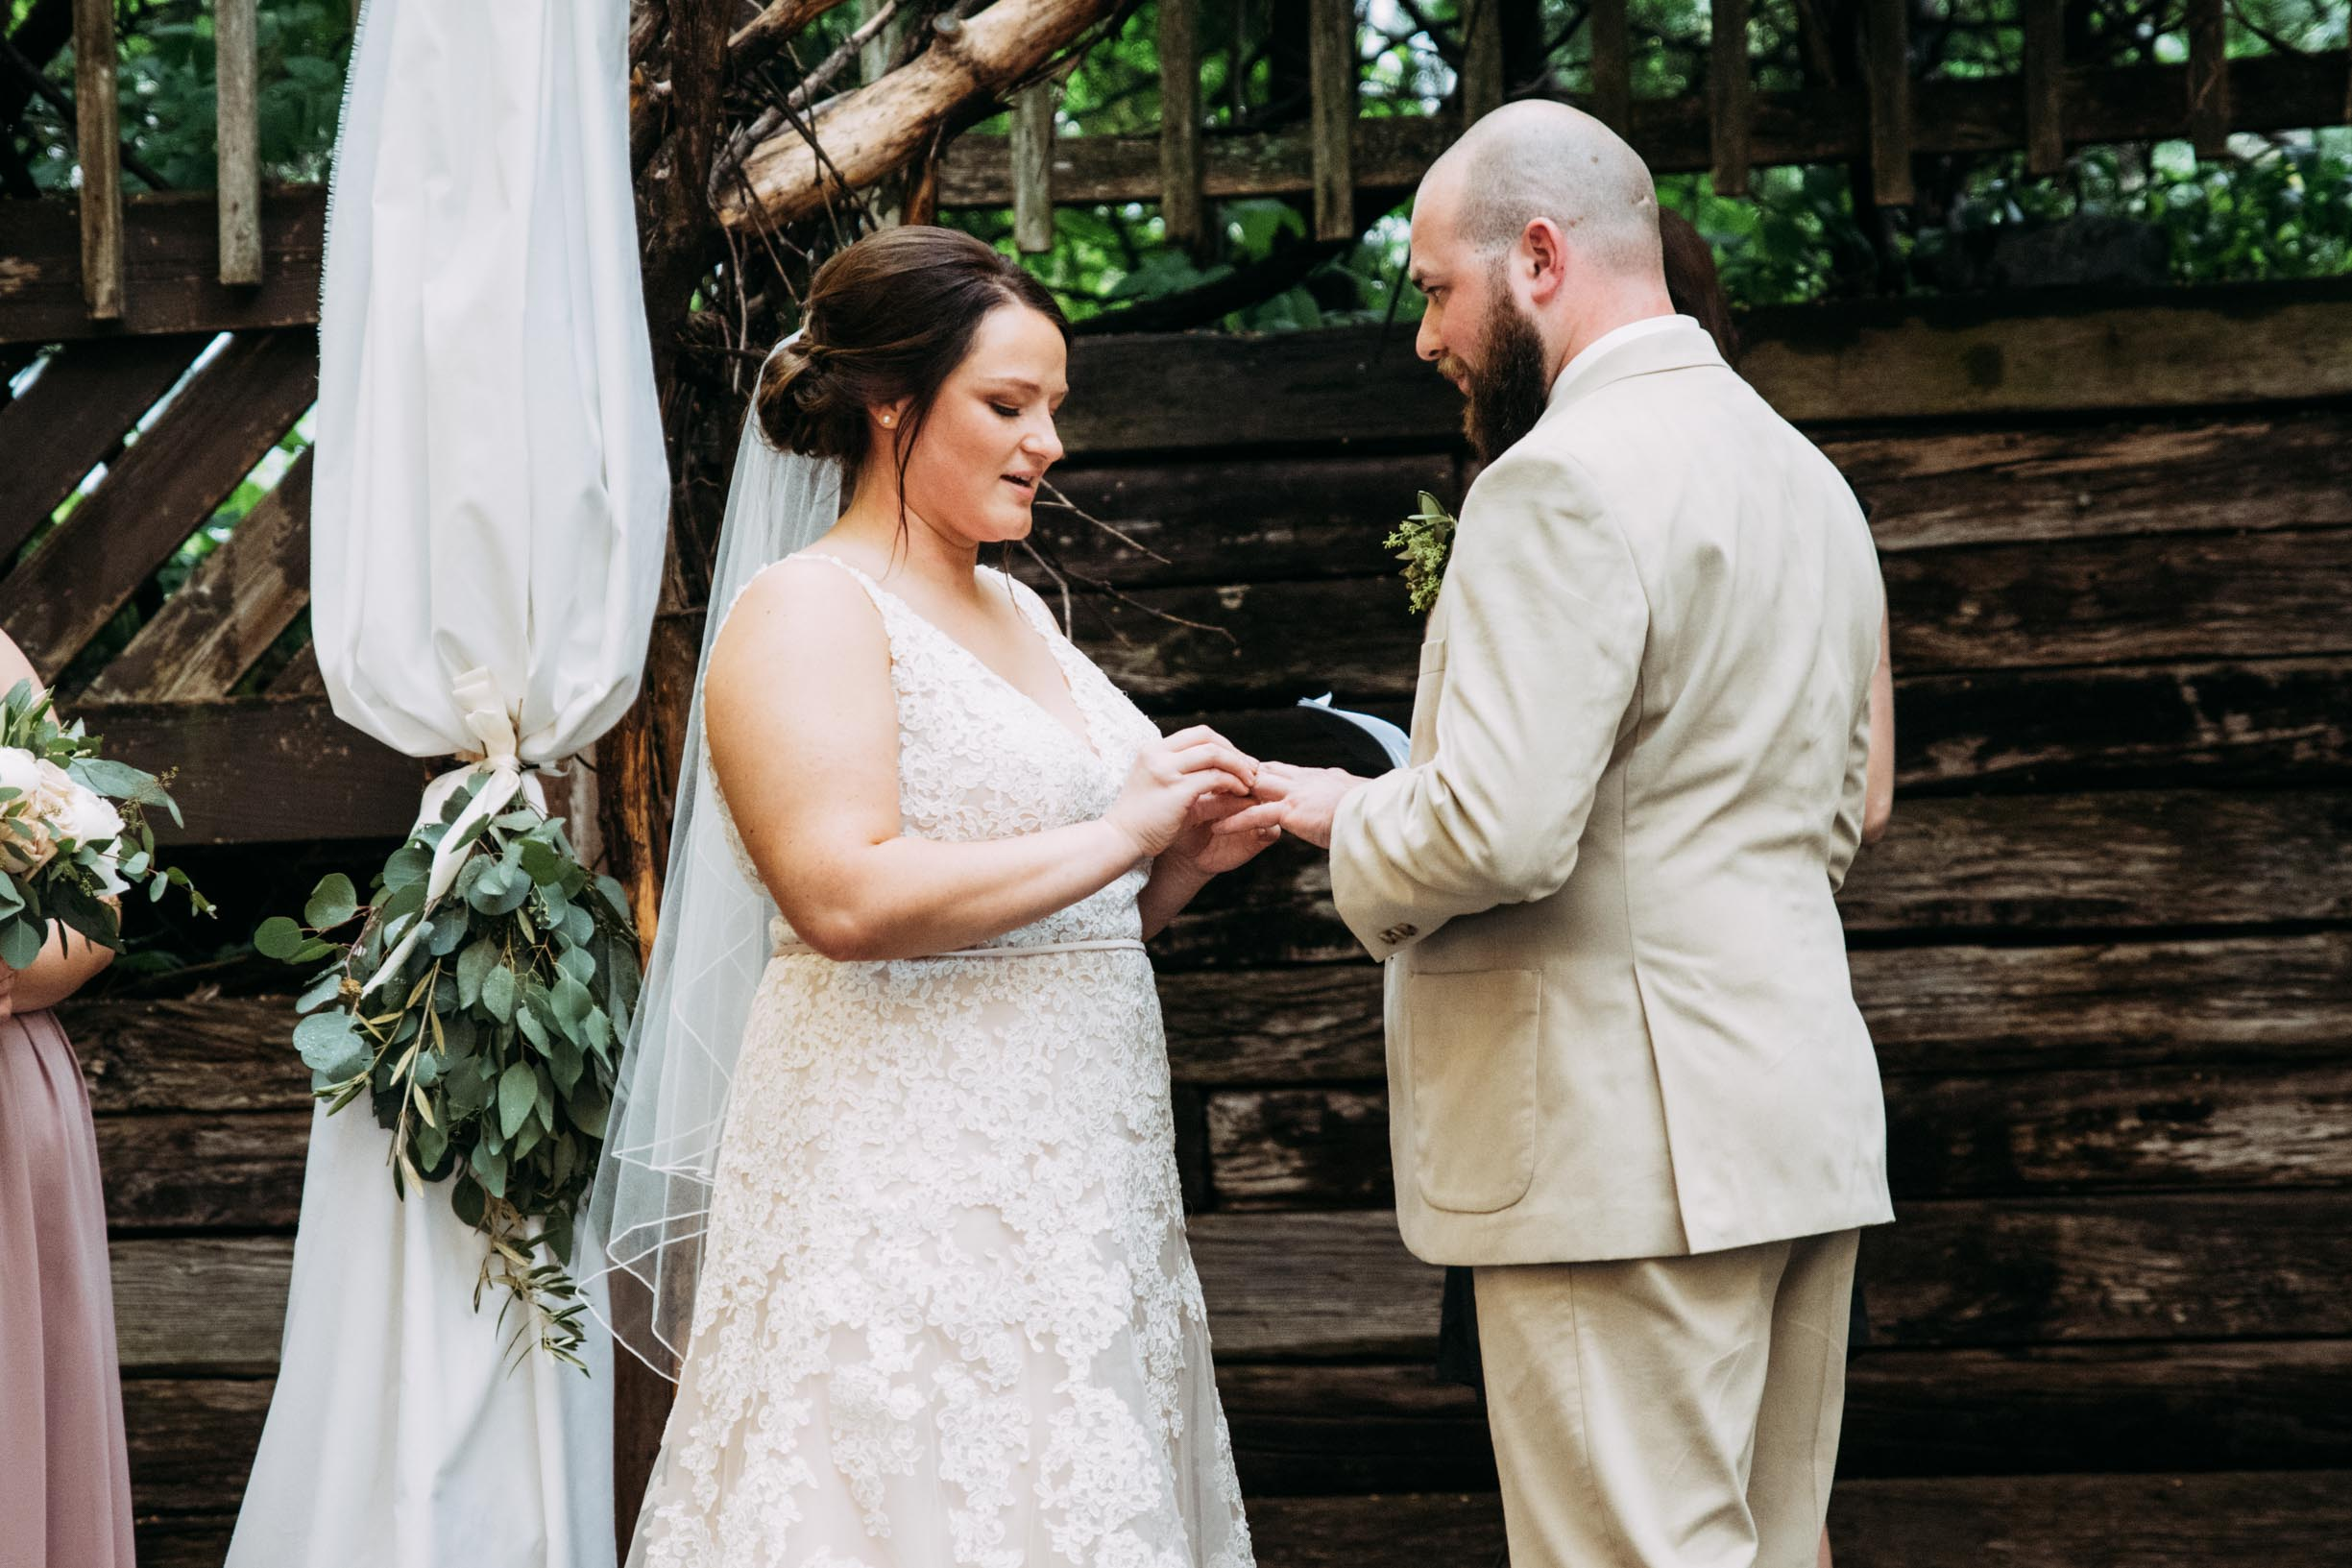 47-Jess_Jeremy_Minnesota_Wedding_Ceremony.jpg